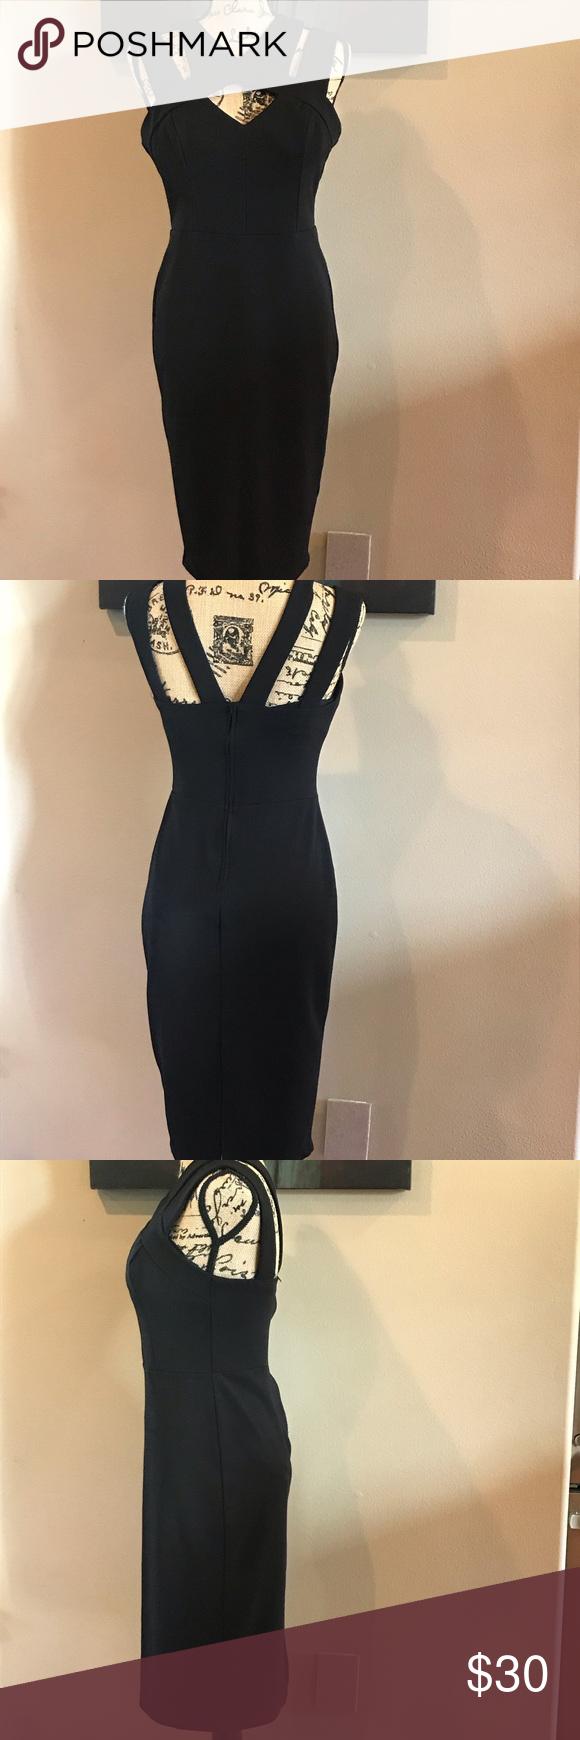 Premier Armour Black Dress Beautiful Black Dresses Black Dress Dresses [ 1740 x 580 Pixel ]